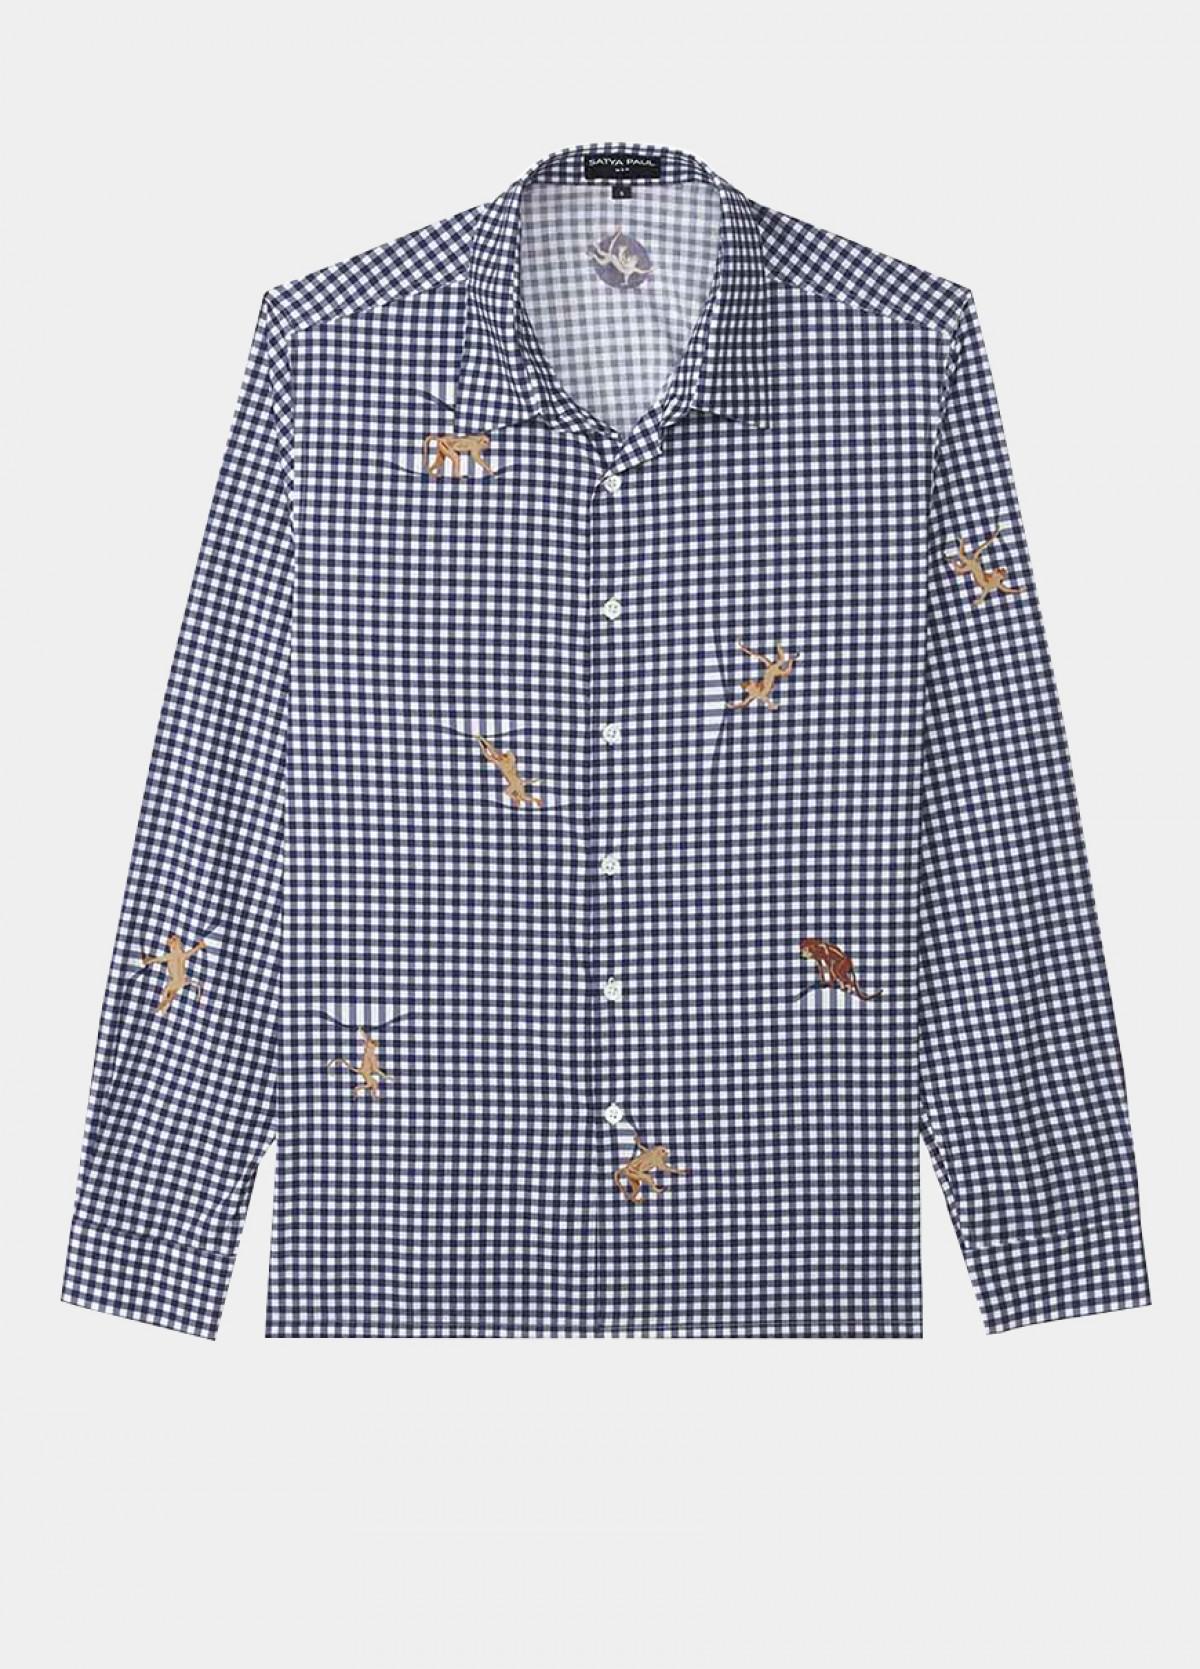 The Chequered Past Shirt